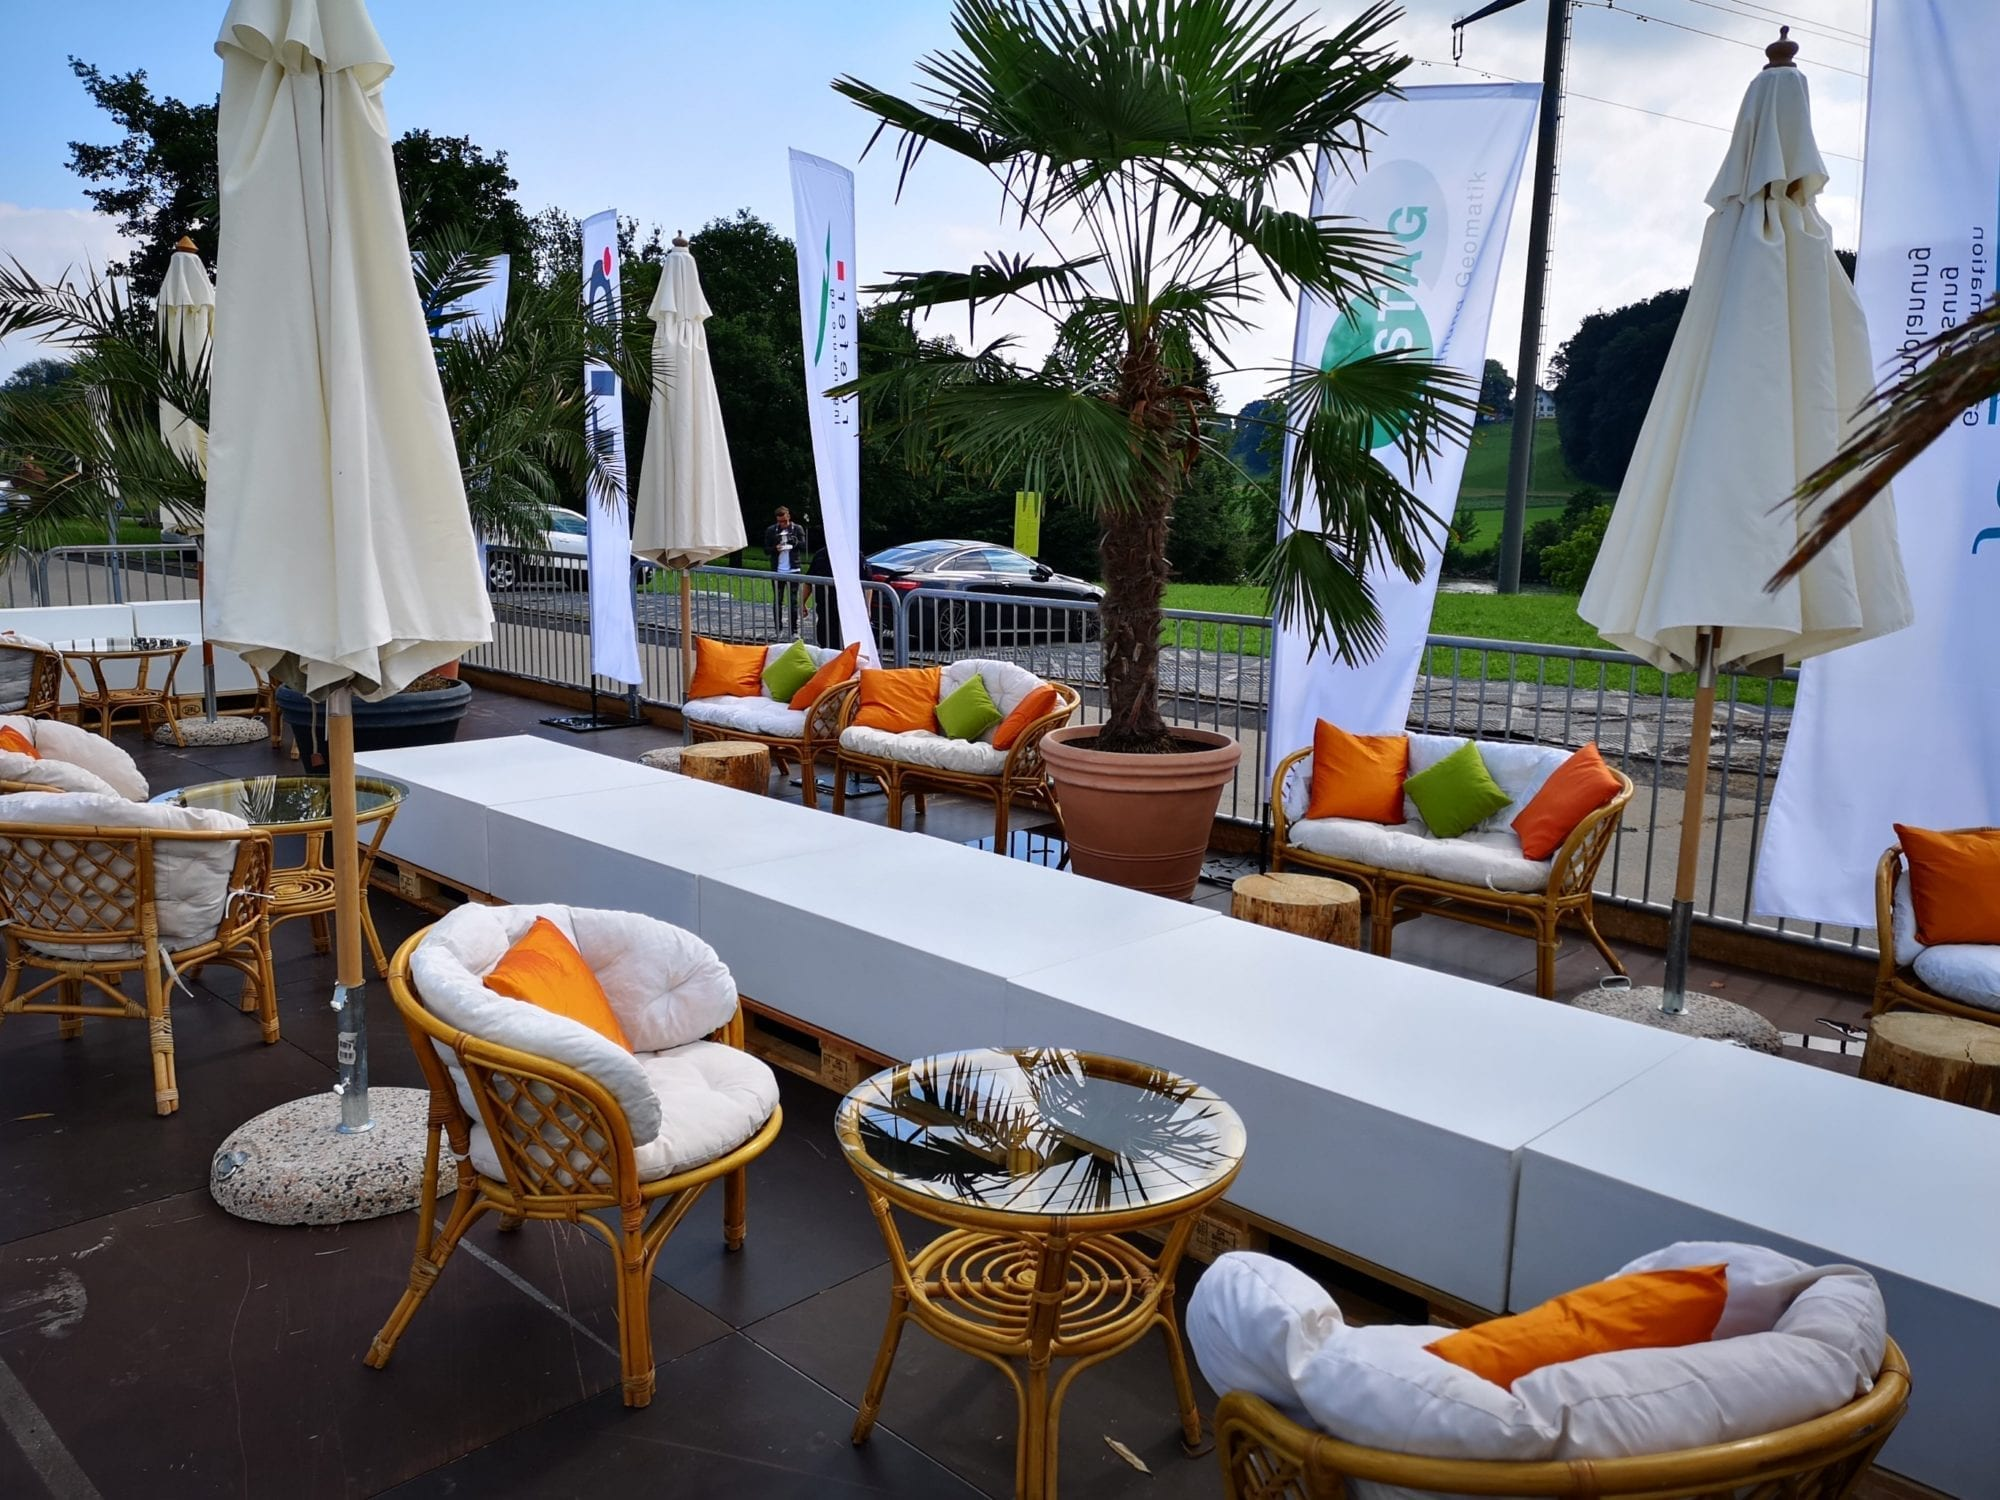 bambus sofa mieten rent-a-lounge 5